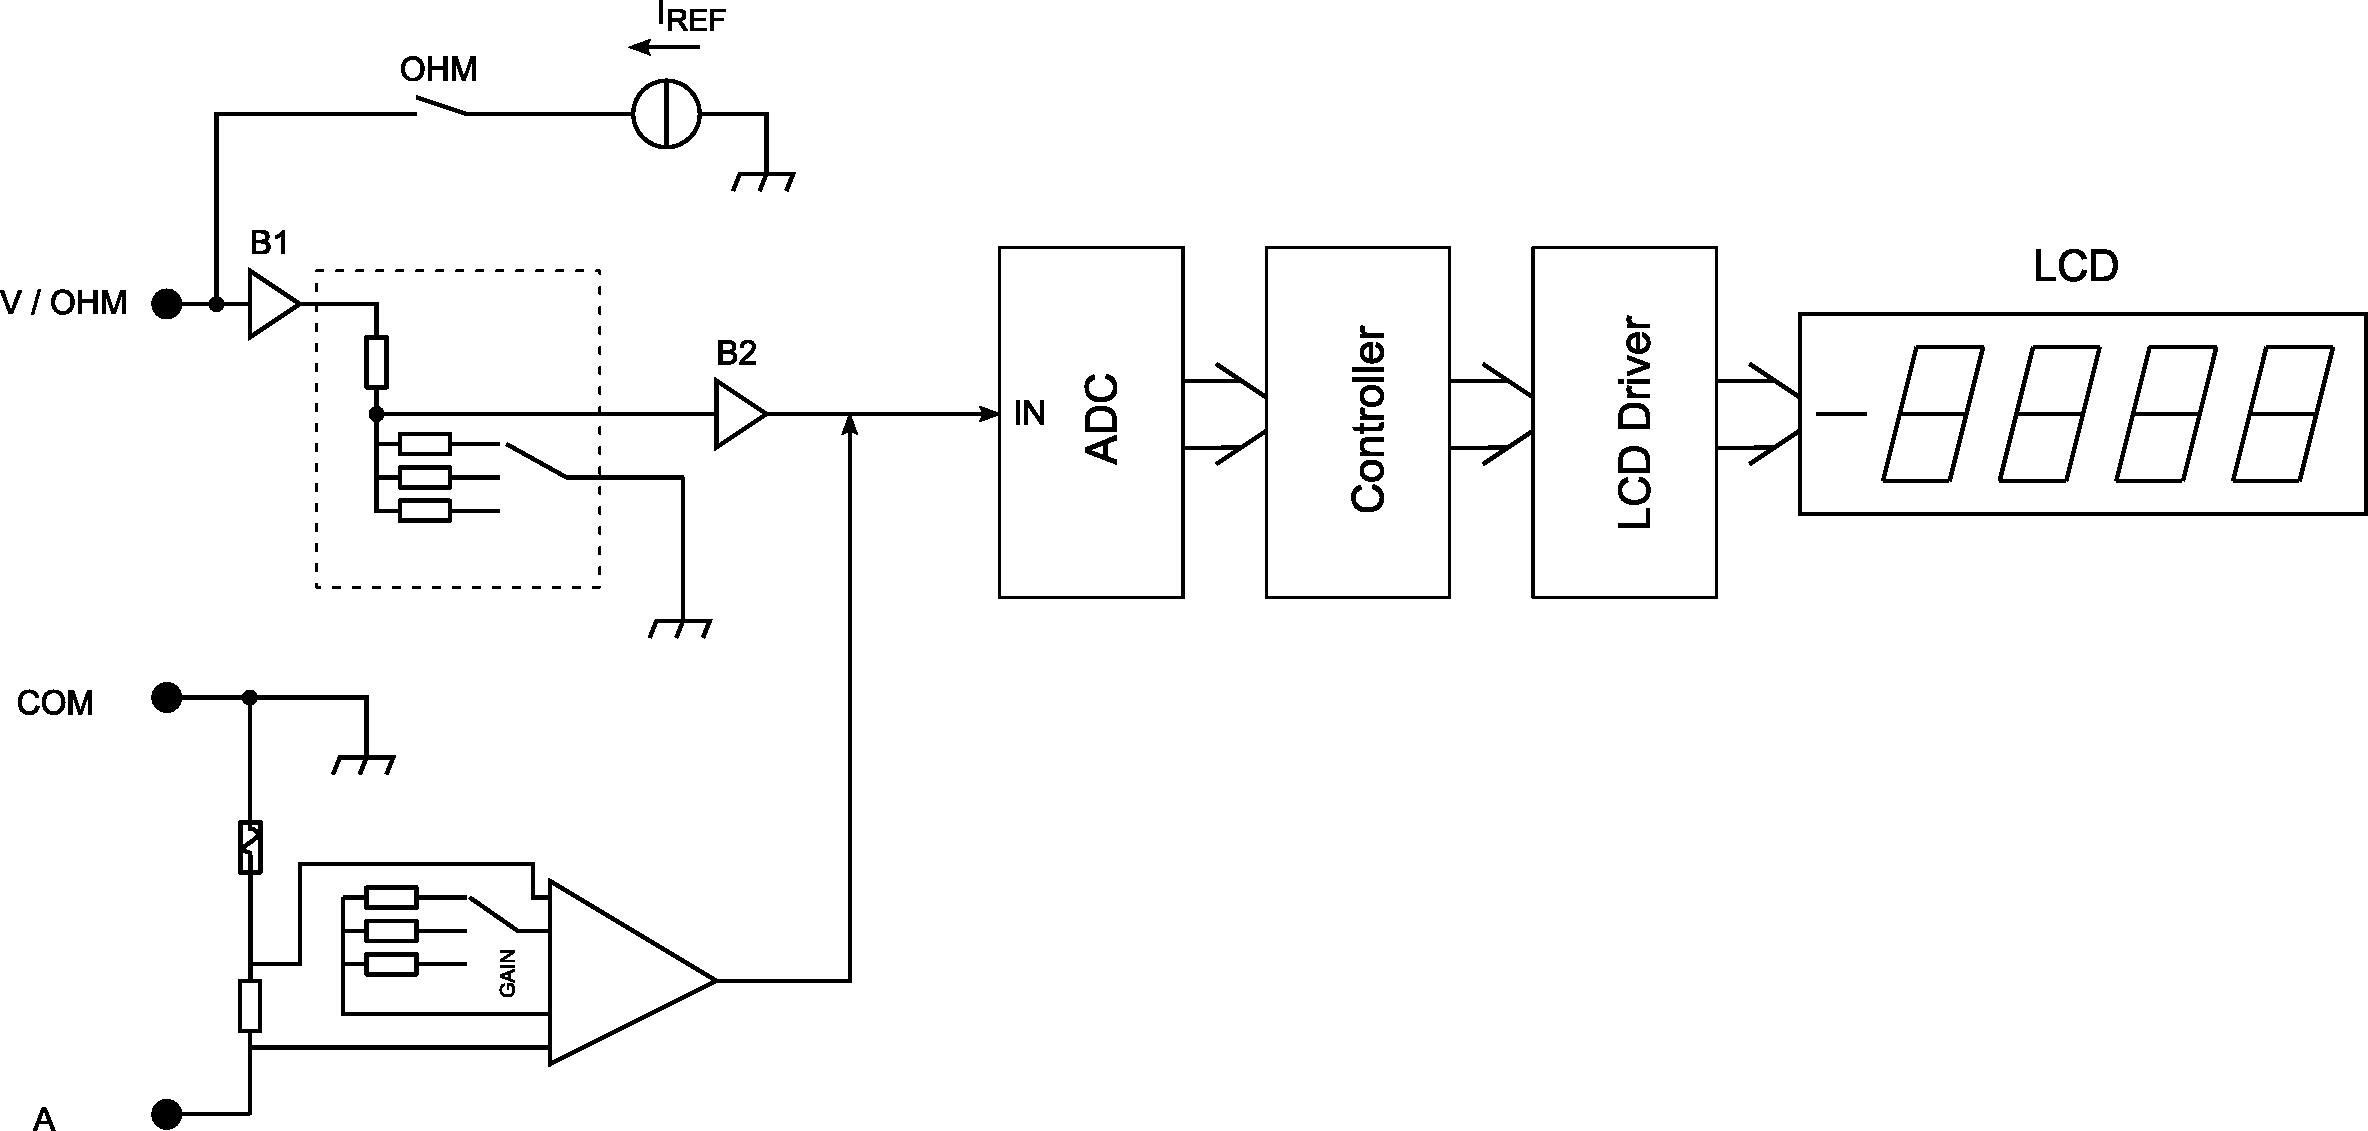 elettrico voltmetro digitale